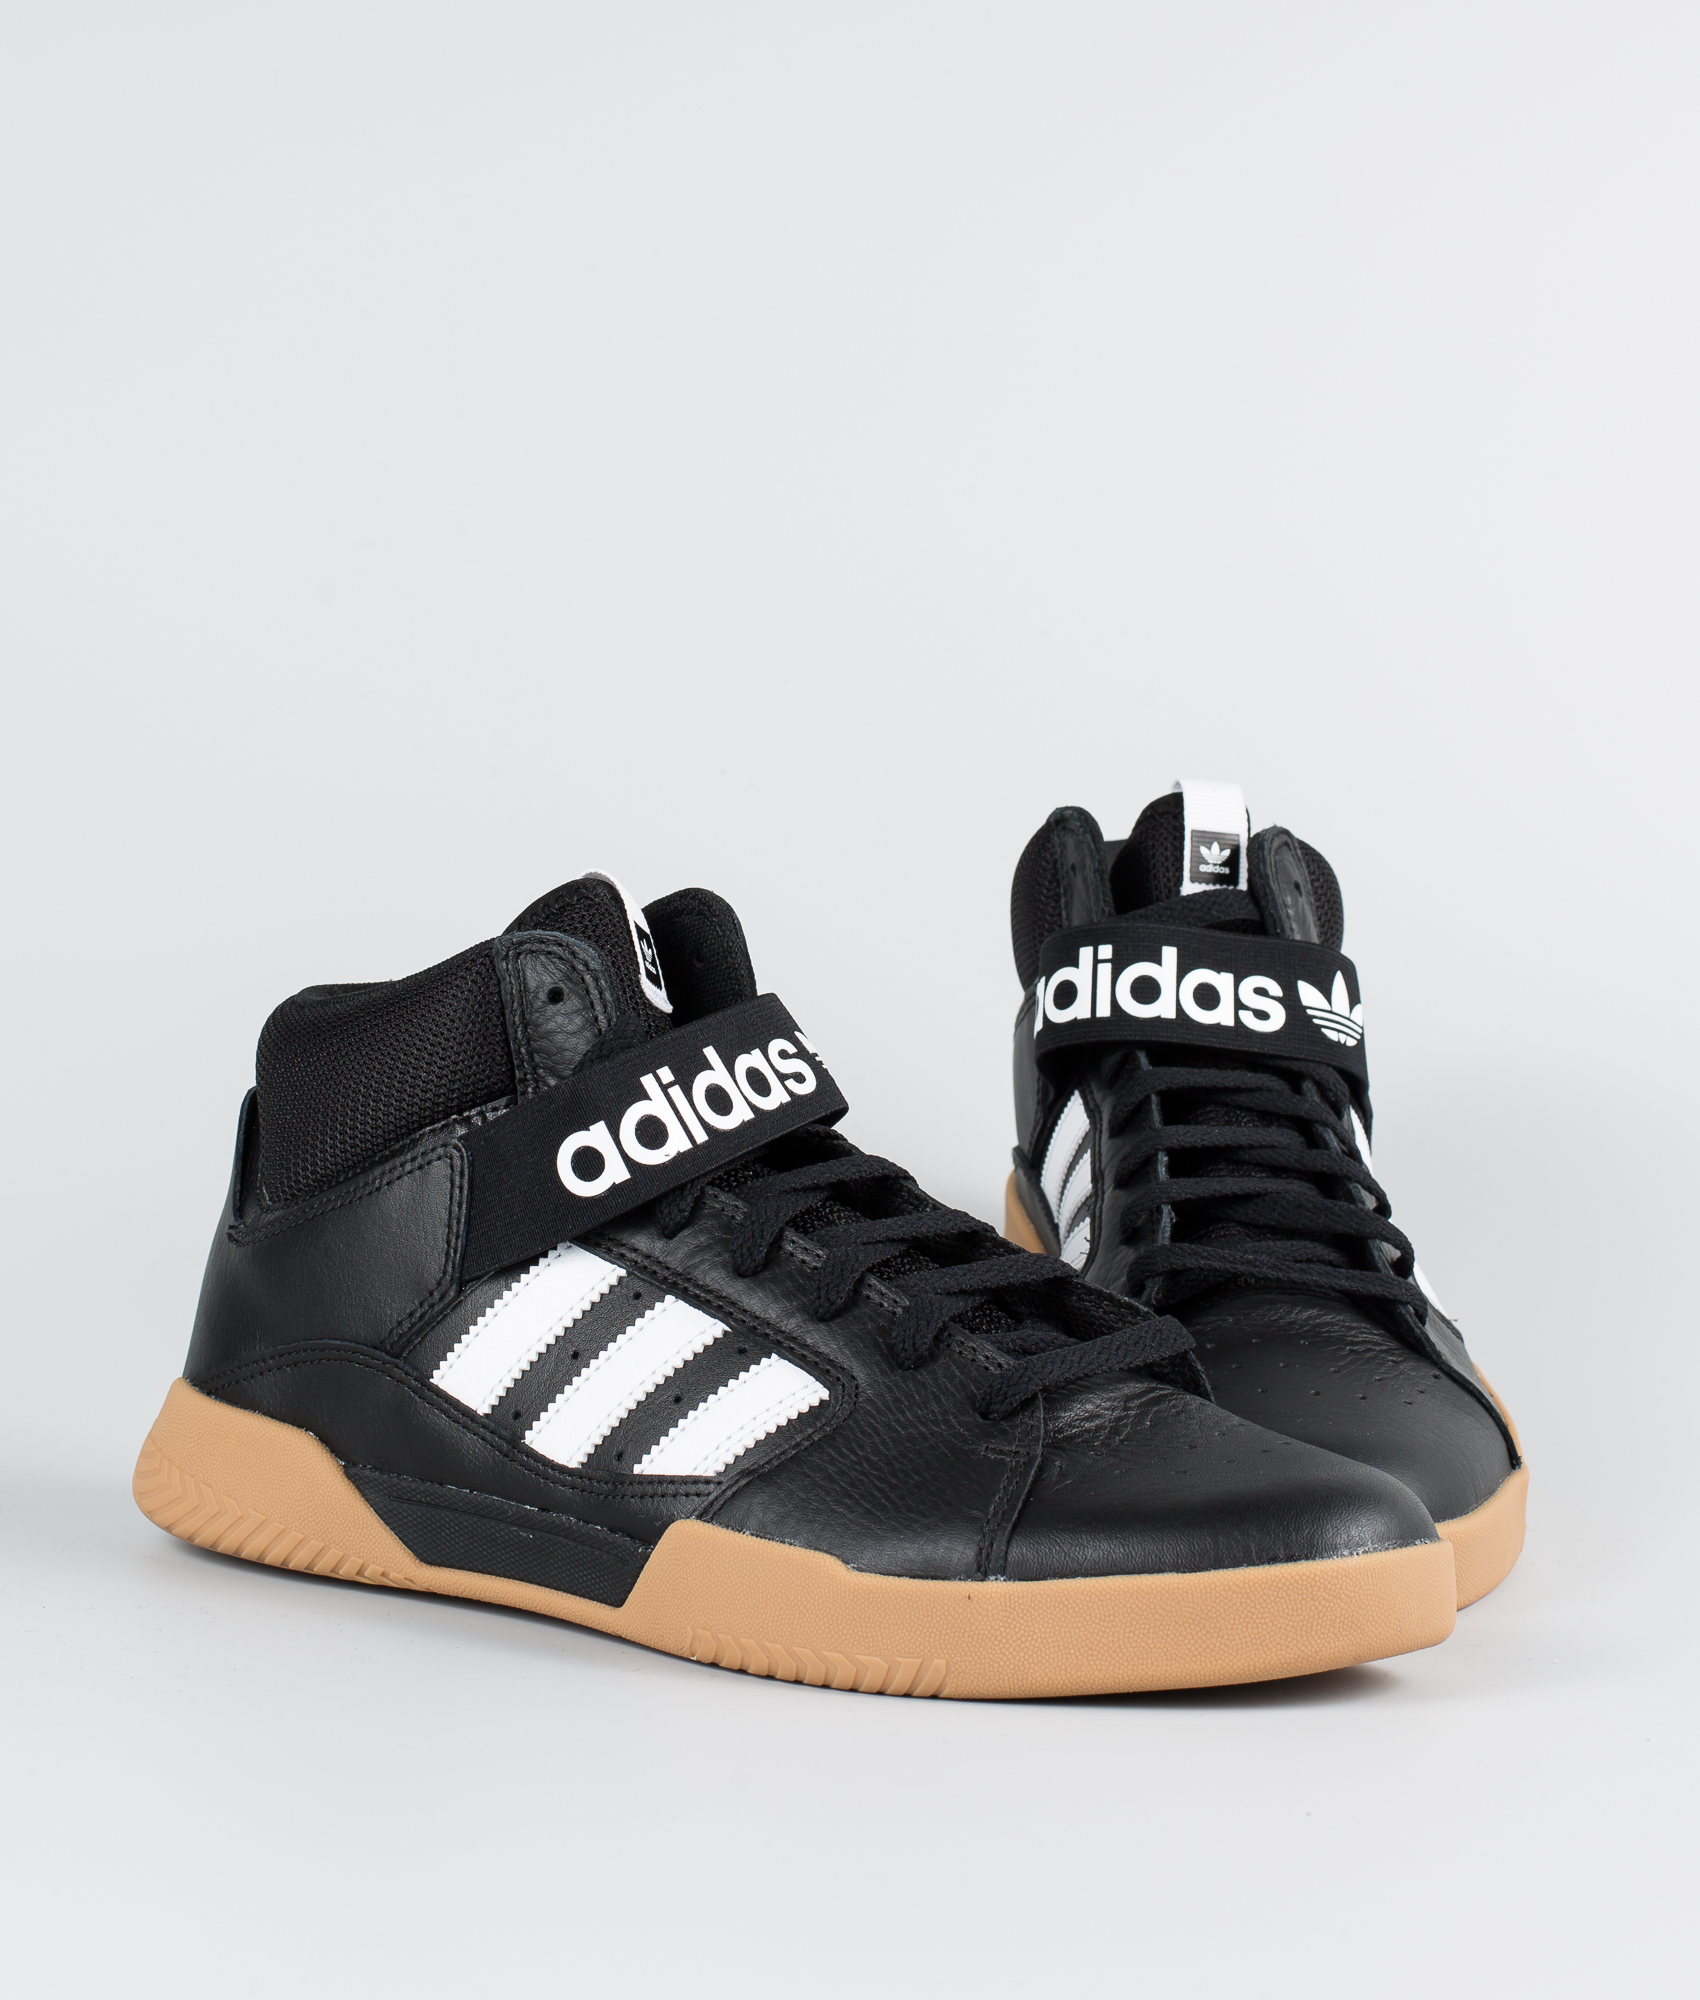 Adidas Skateboarding Vrx Mid Sko Core BlackFtwr WhiteGum4